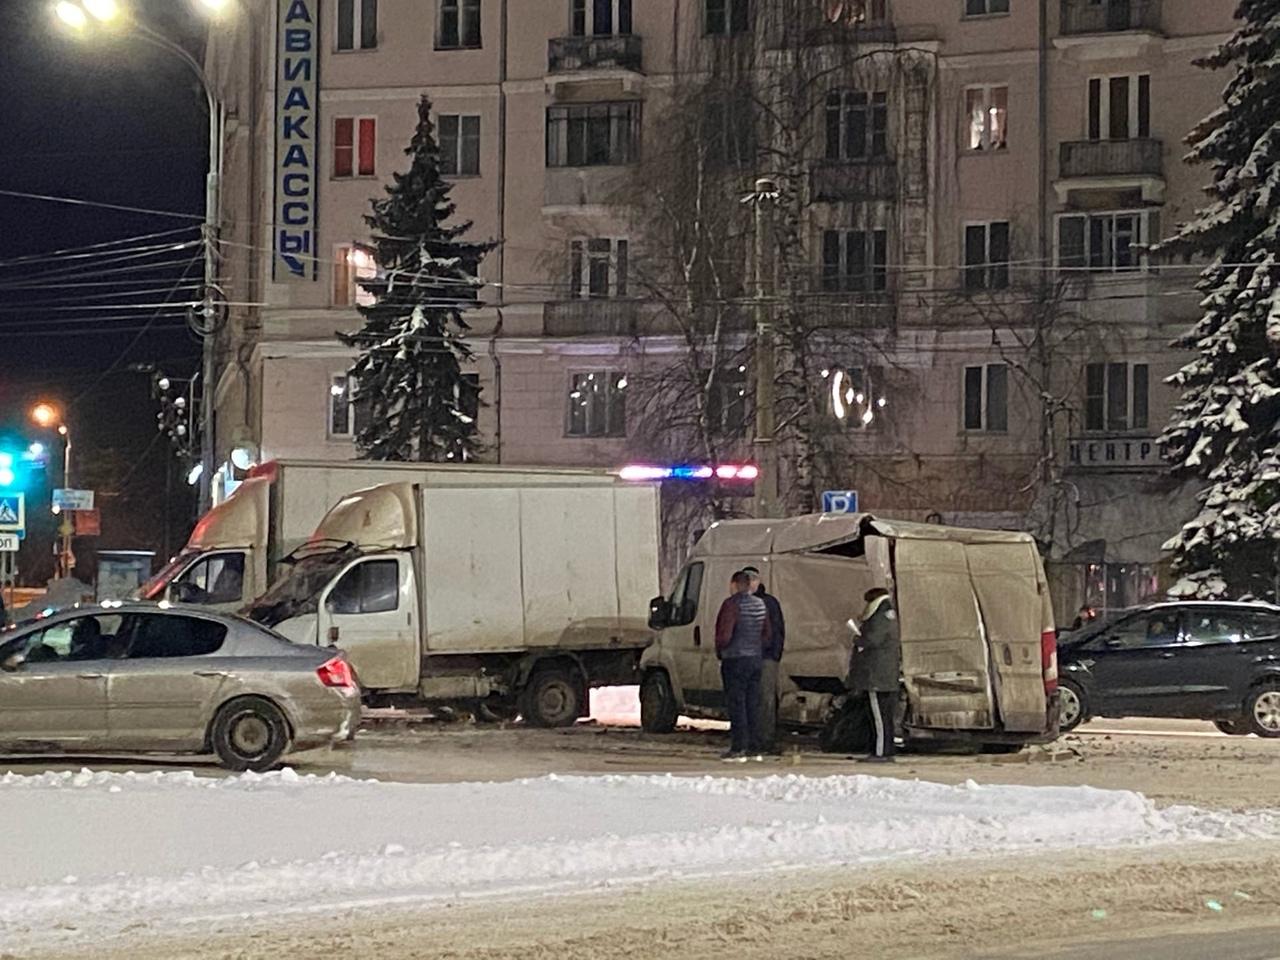 В центре Твери на светофоре столкнулись автомобили